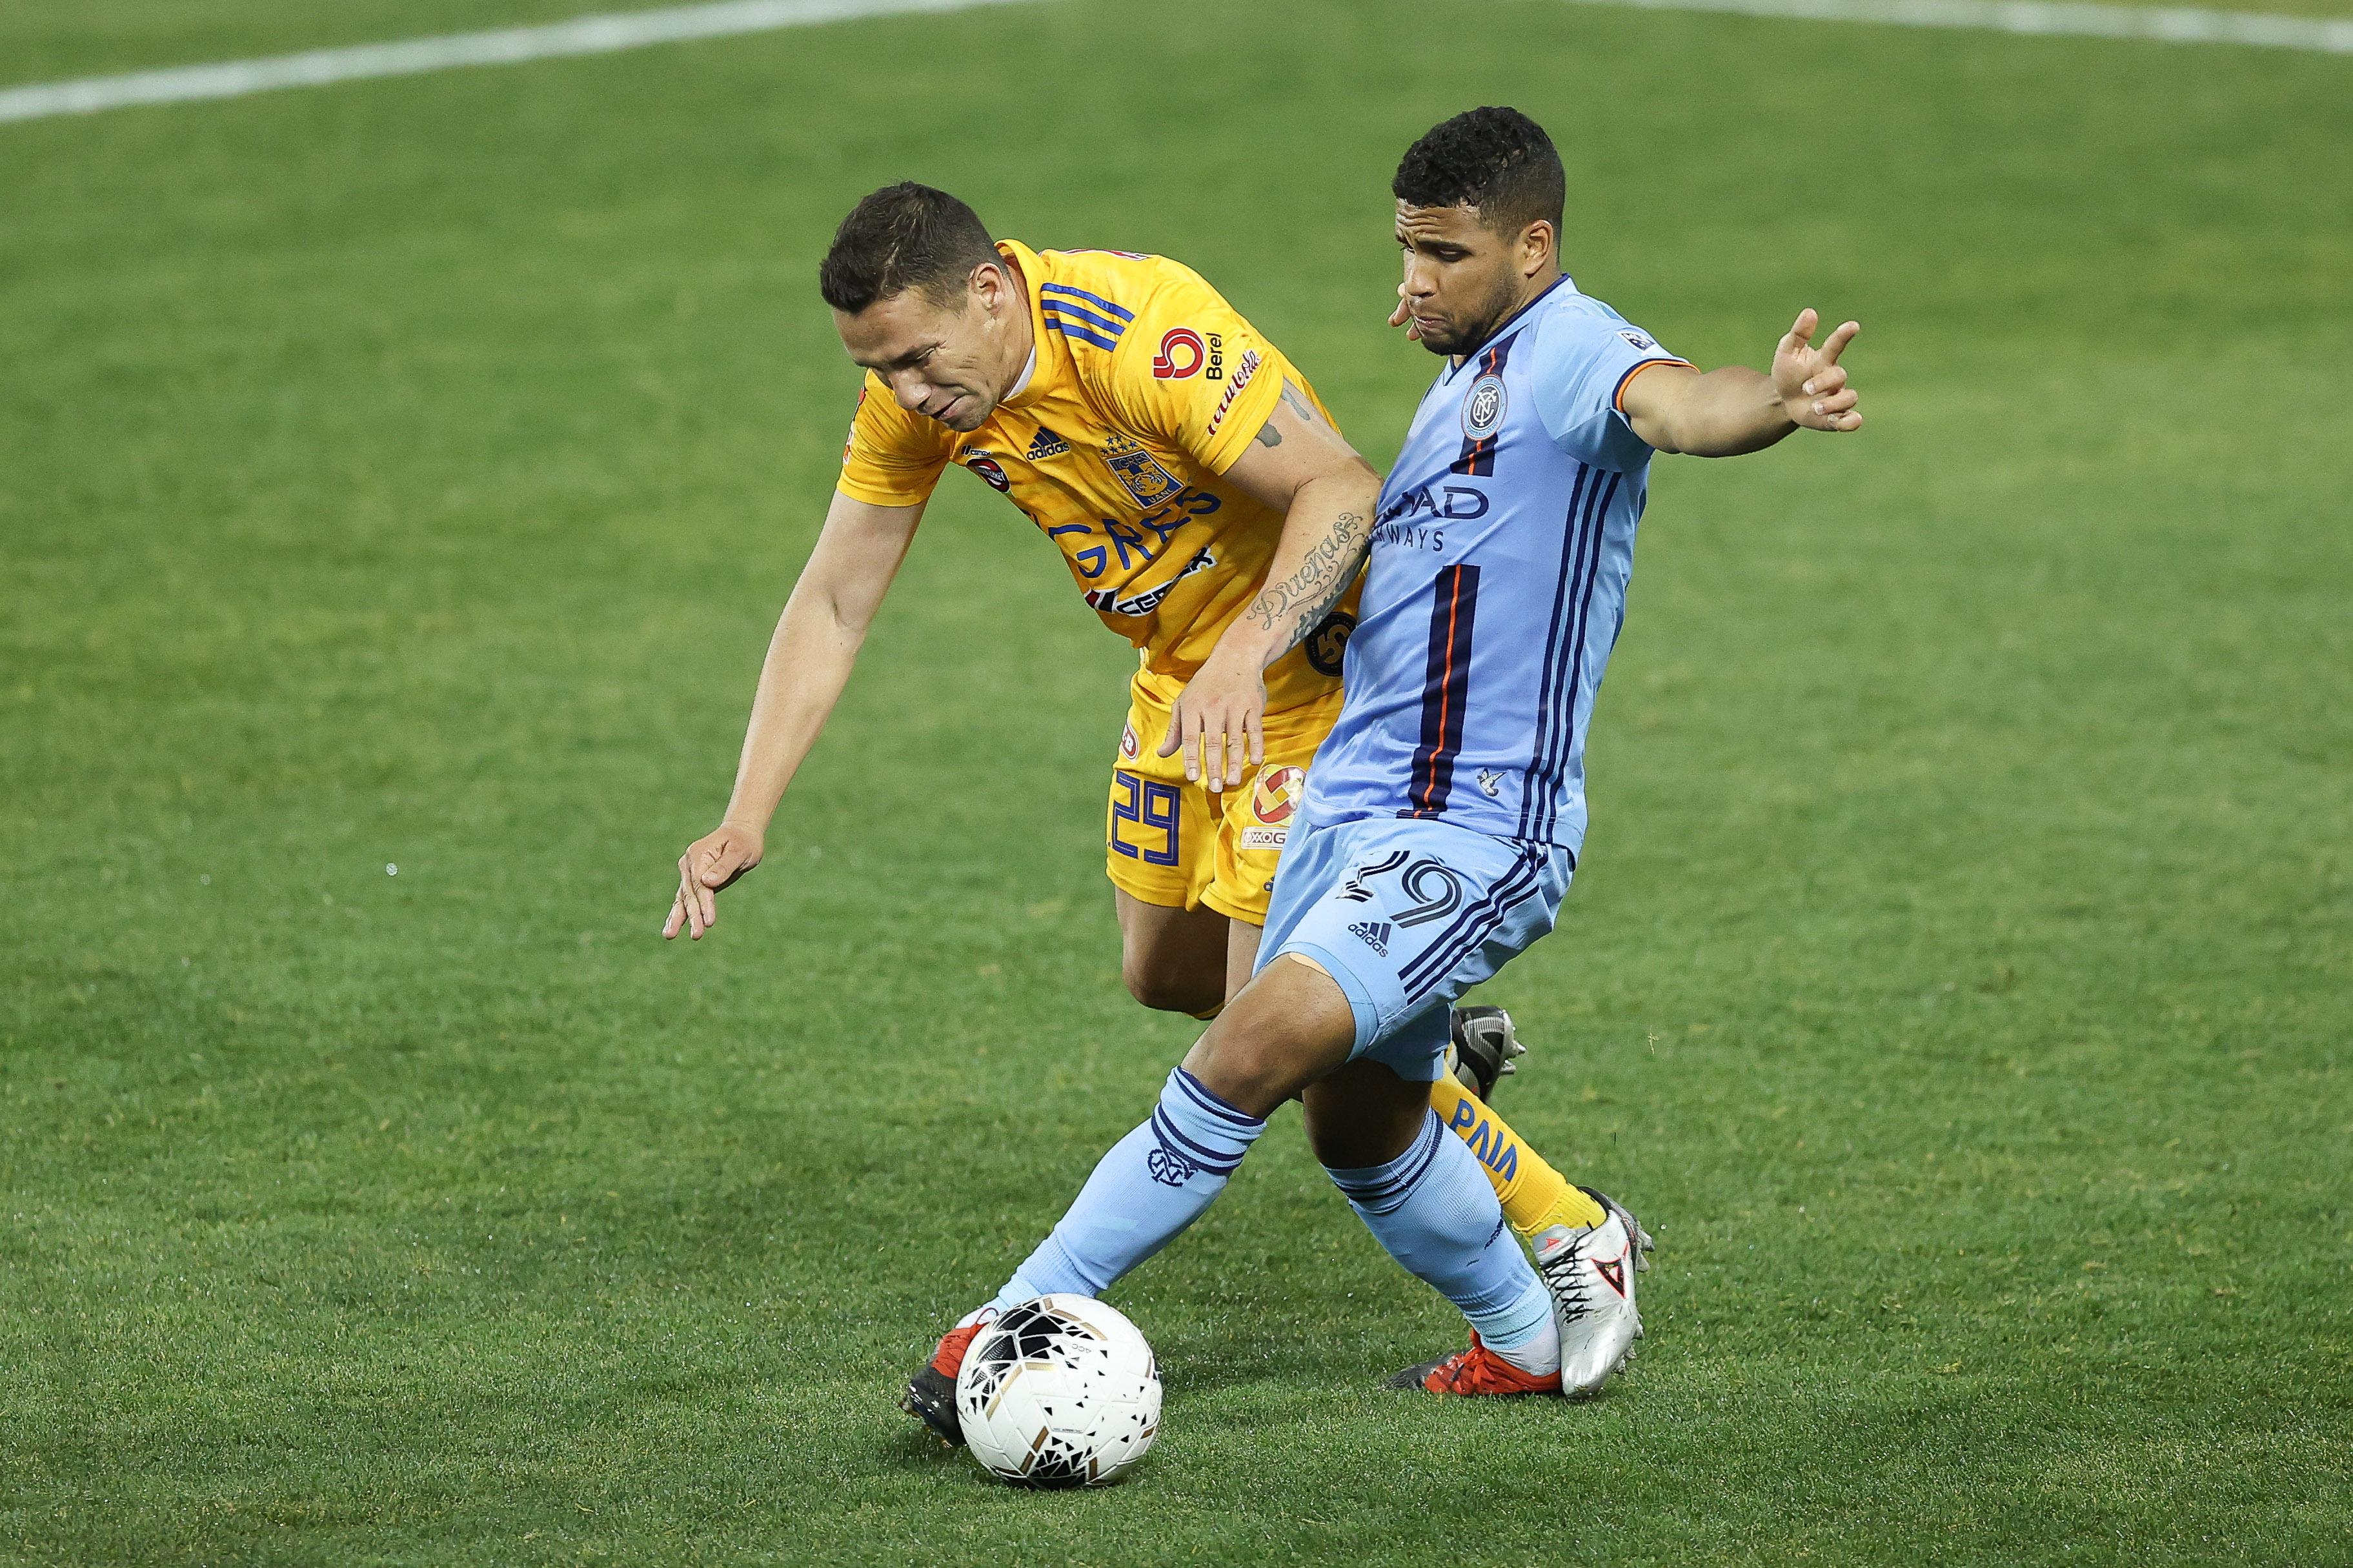 MLS: Champions League Quarterfinal-Club Tigres at New York City FC